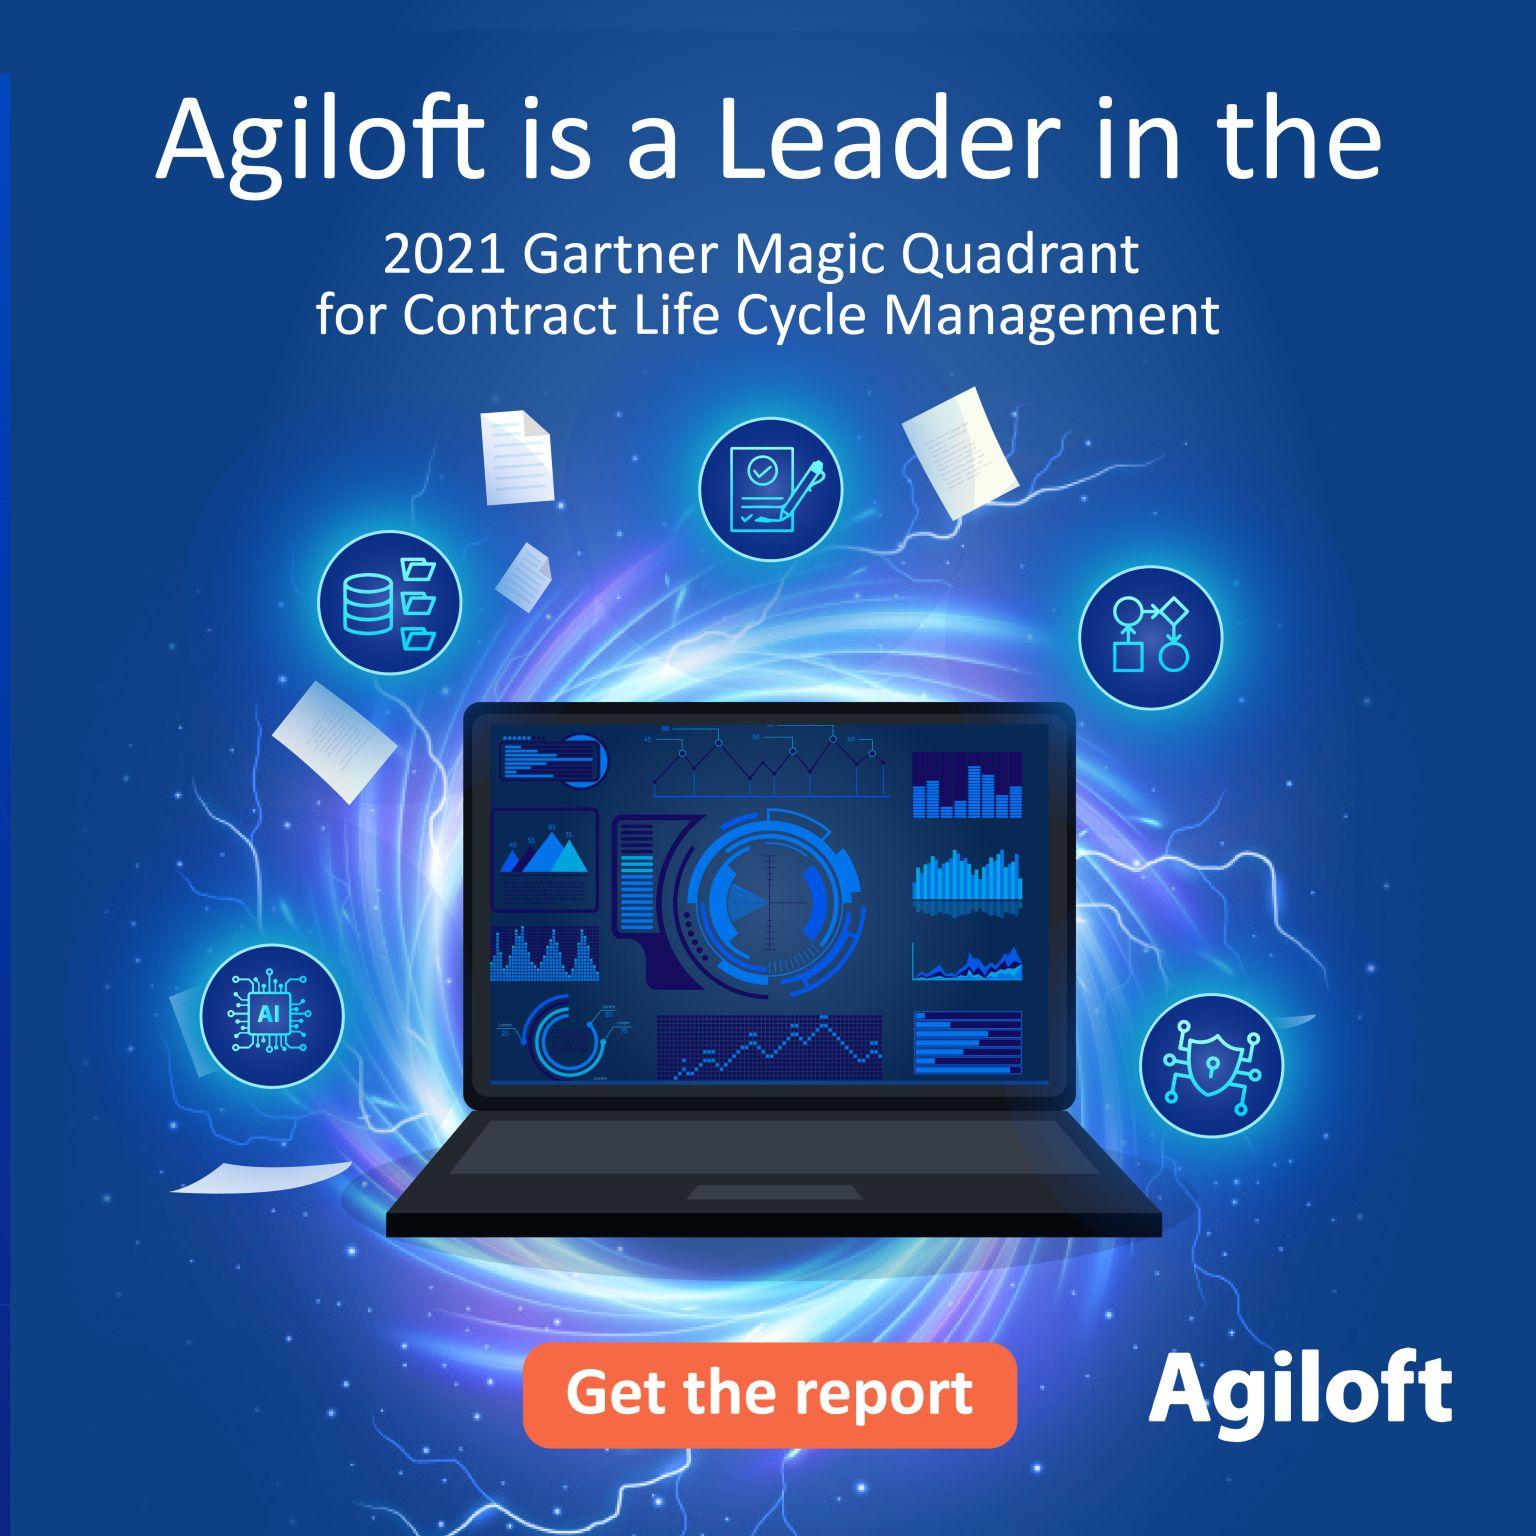 Agiloft is AGAIN named a leader in Gartner's Magic Quadrant for CLM